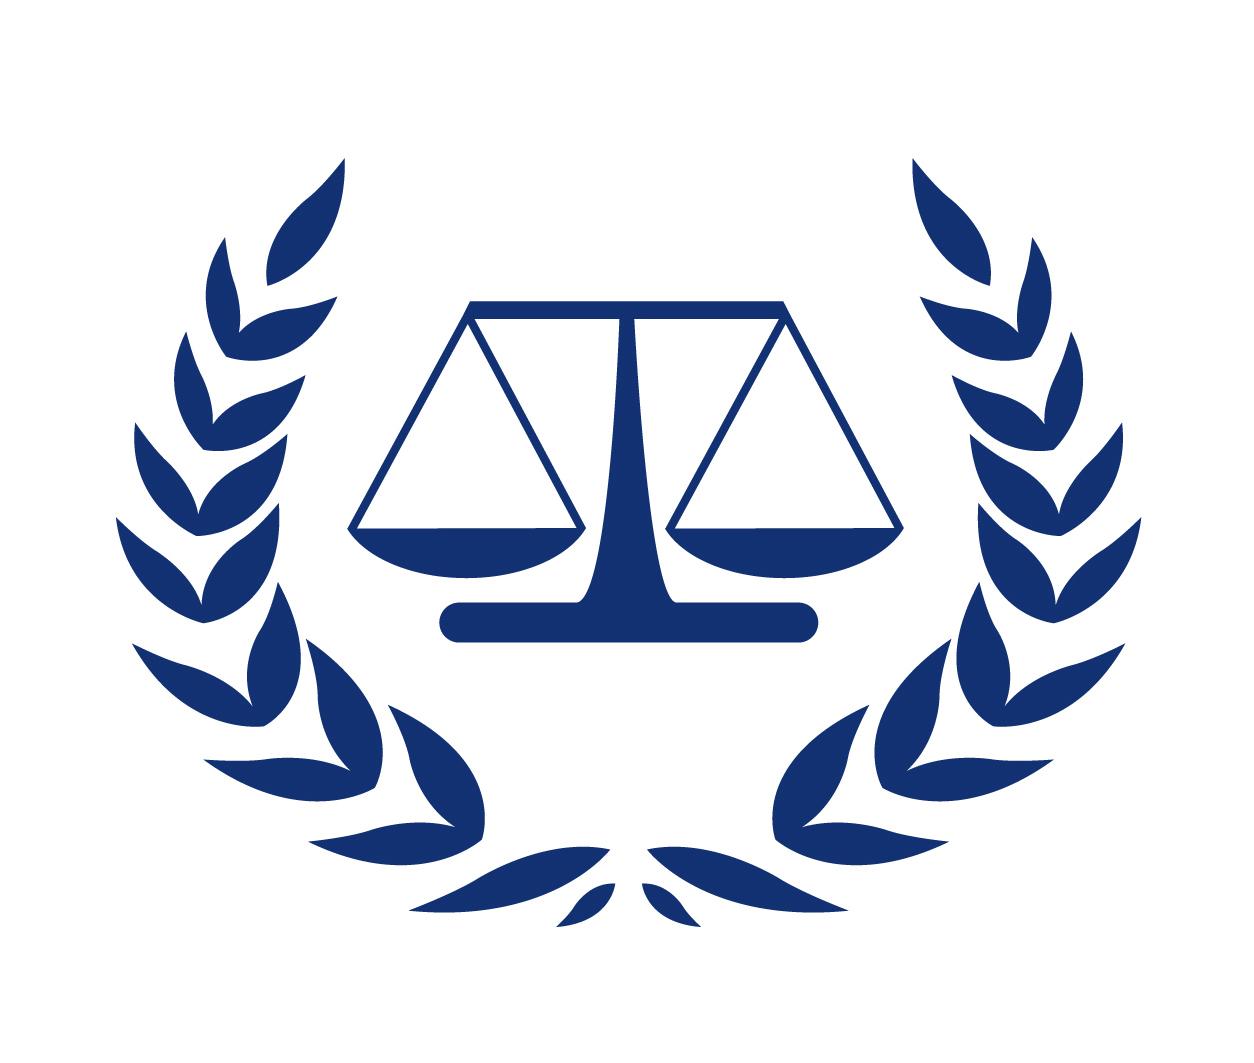 LogotypeTribunal Pénal de la Haye